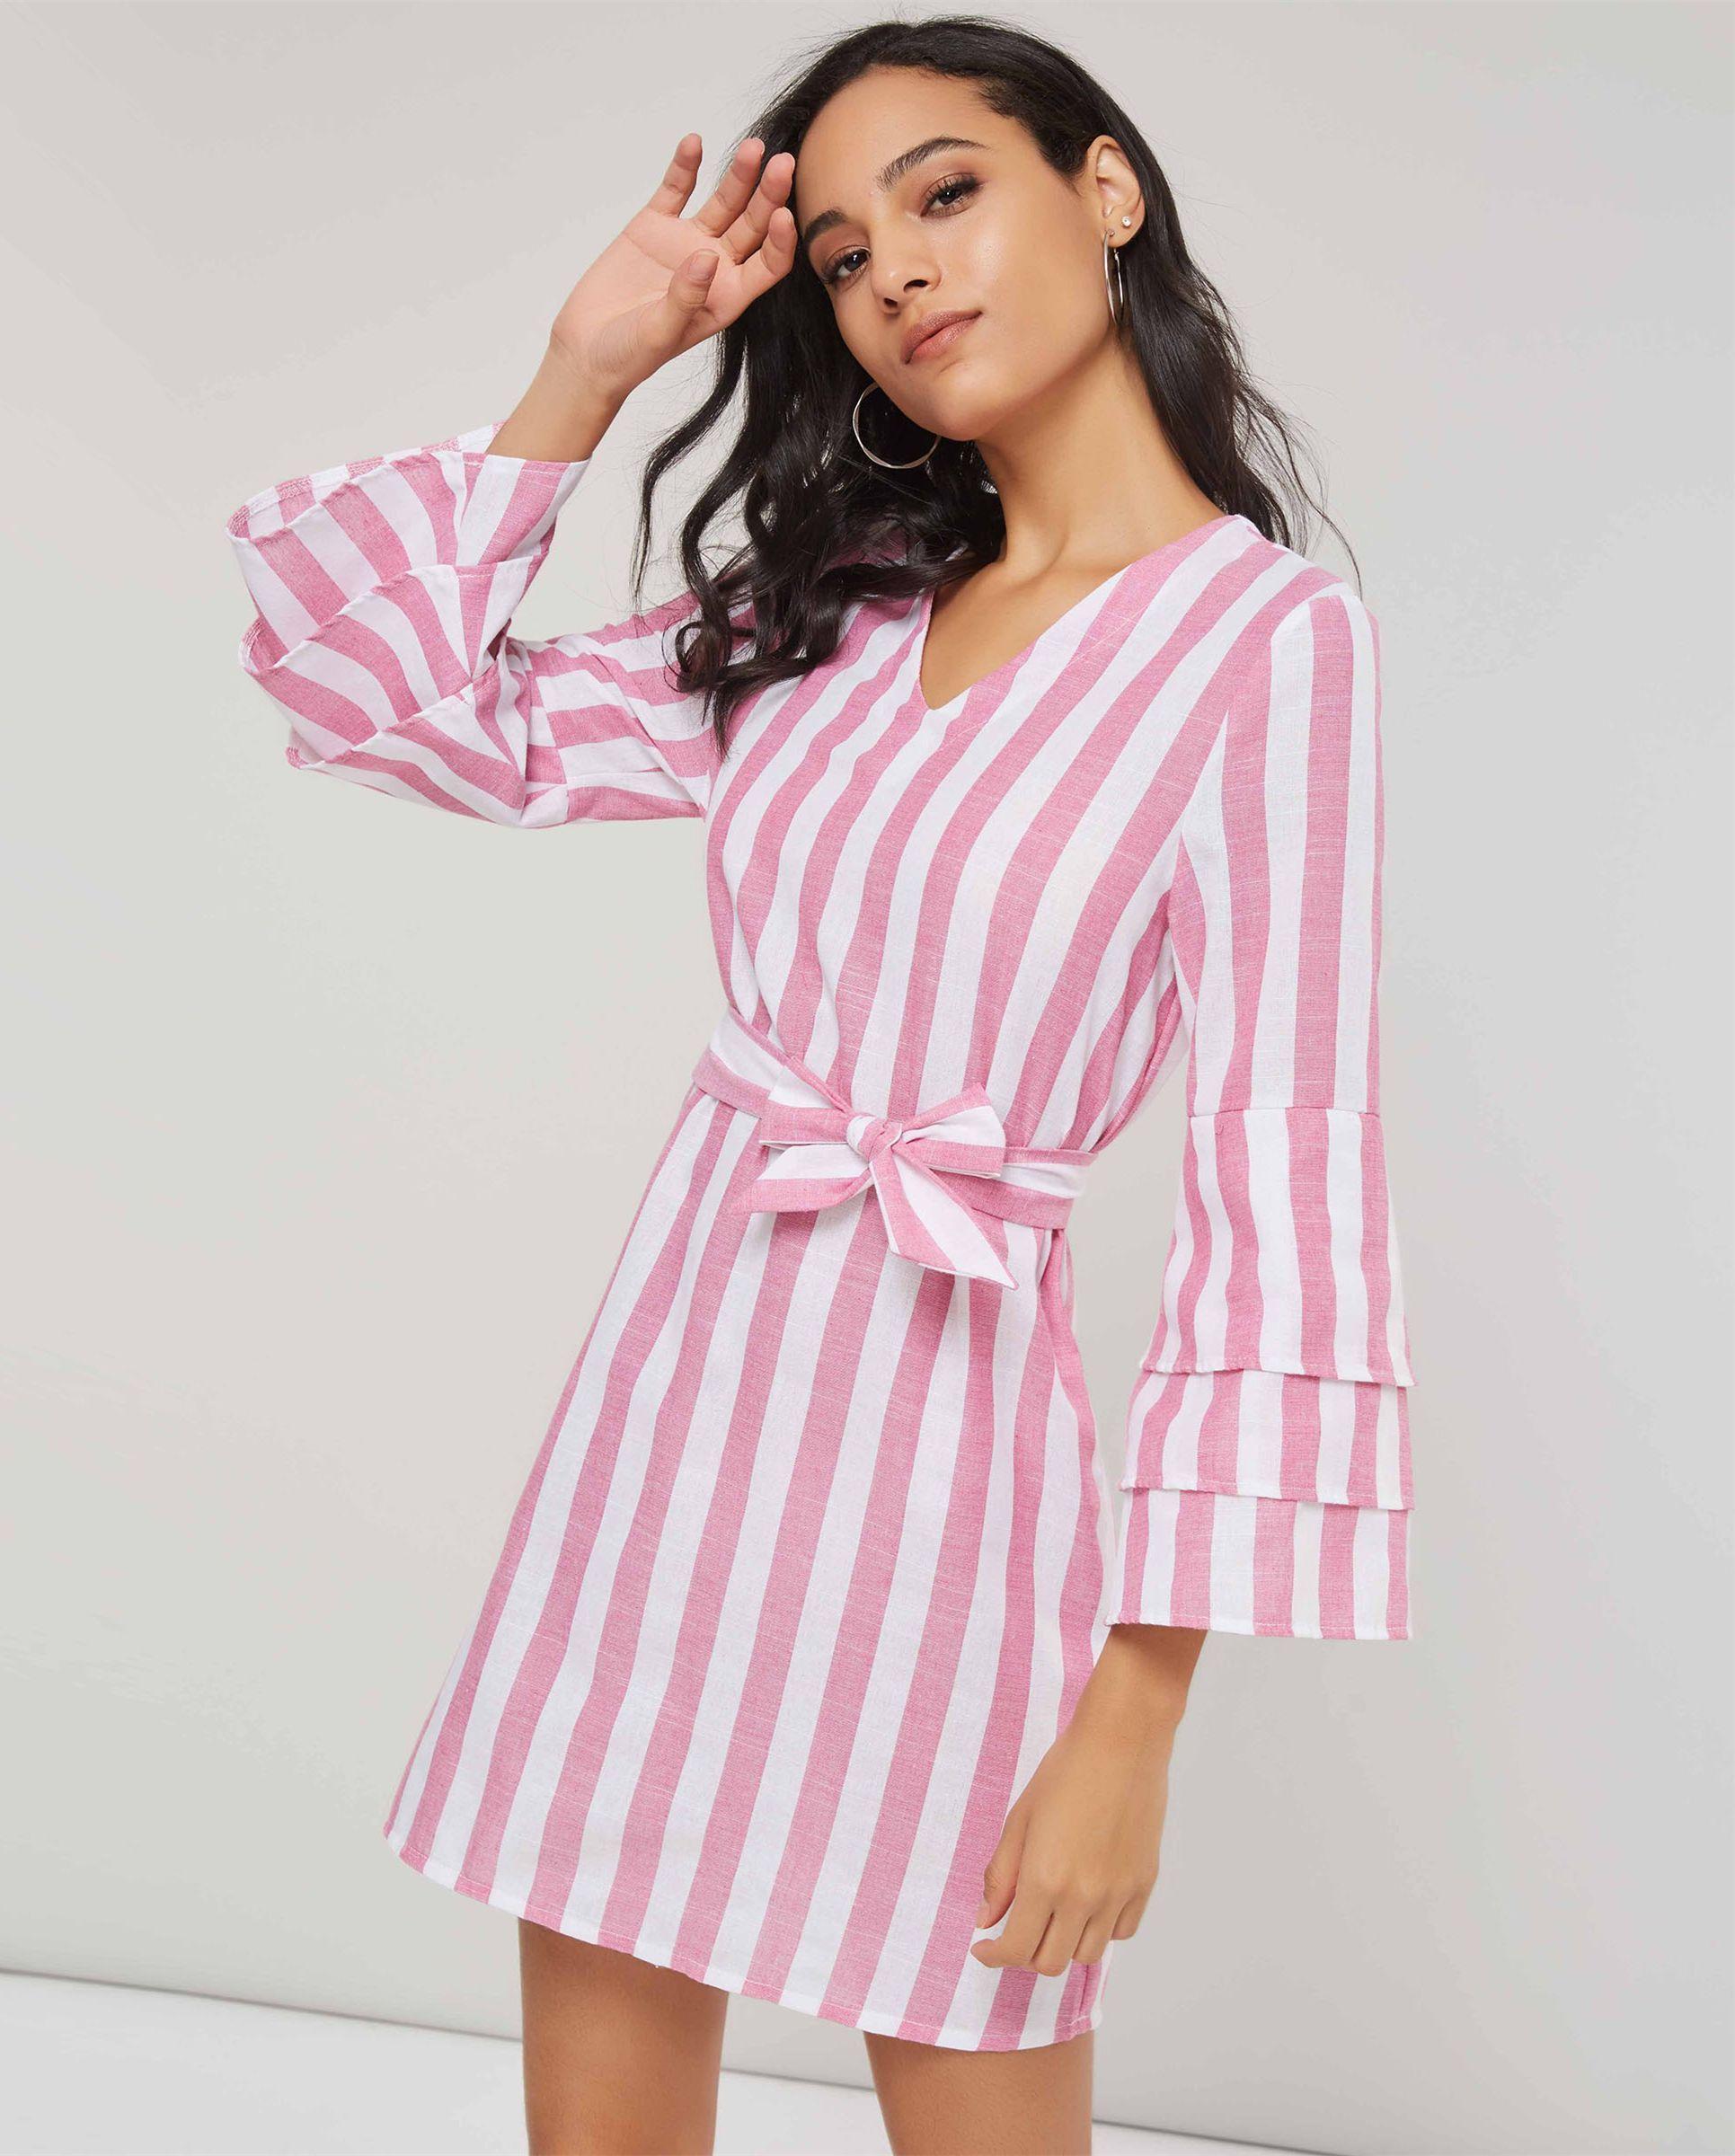 Stripe bowknot vneck womenus long sleeve dress in dresses